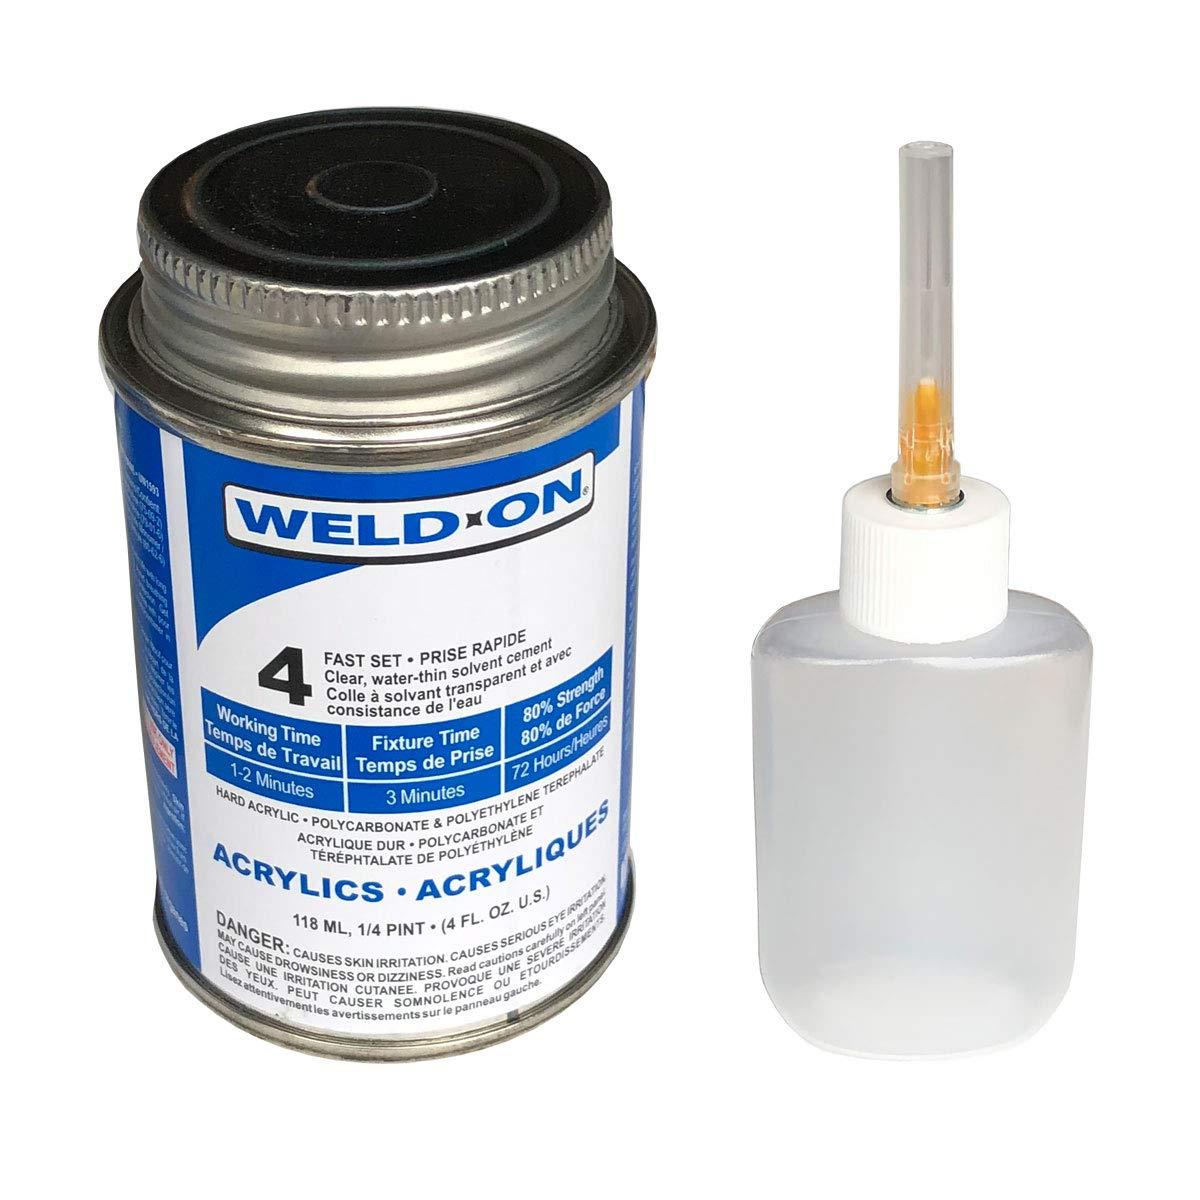 Weldon #4 with Applicator Bottle - 1/4 Pint - 4oz - 10308 - 1 each